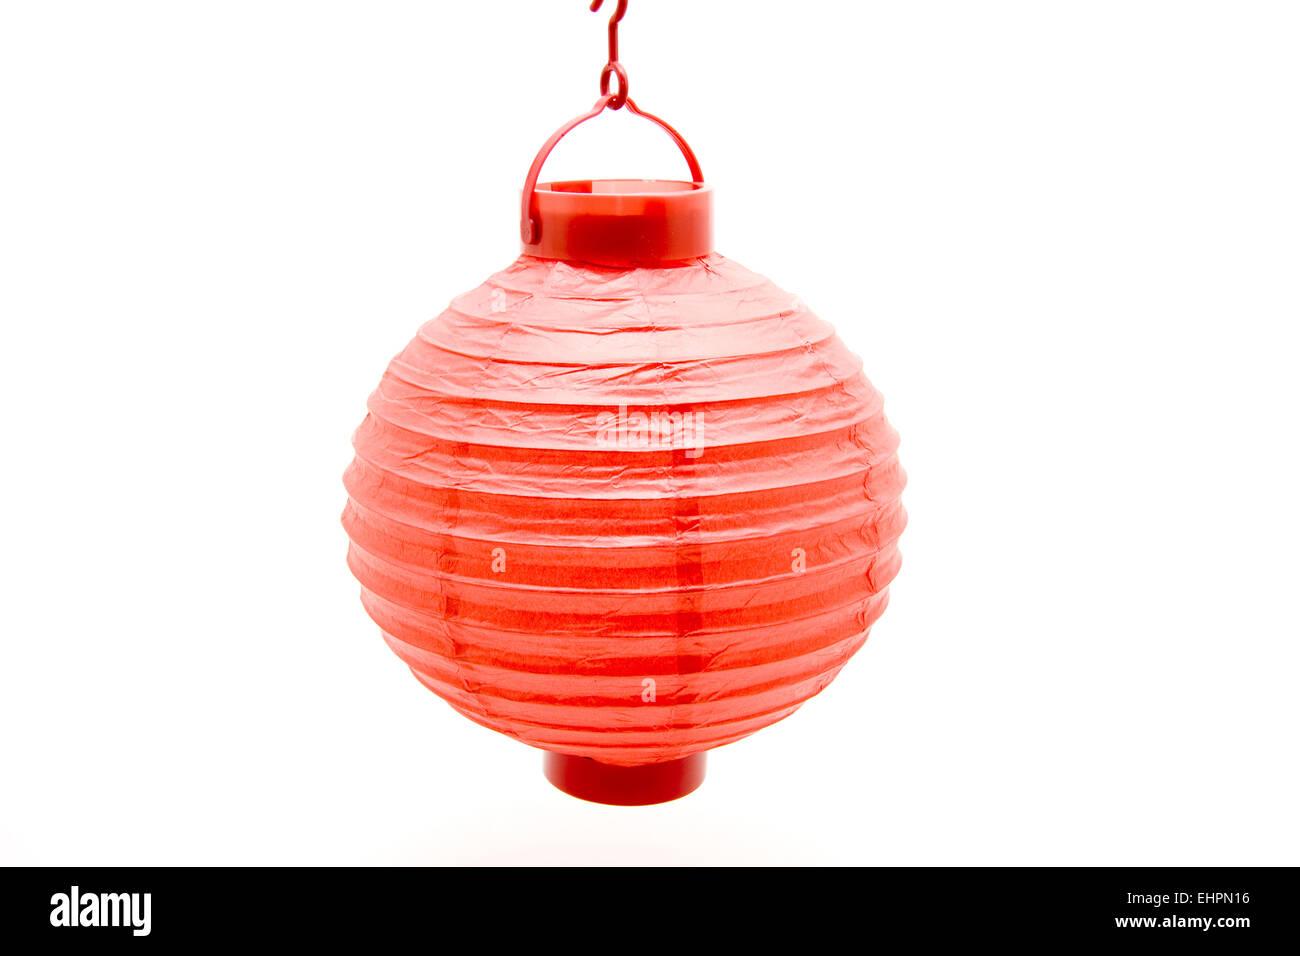 Stockfotosamp; Lampe Stockfotosamp; Alamy Lampe Alamy Red Bilder Red Bilder 0wN8nm